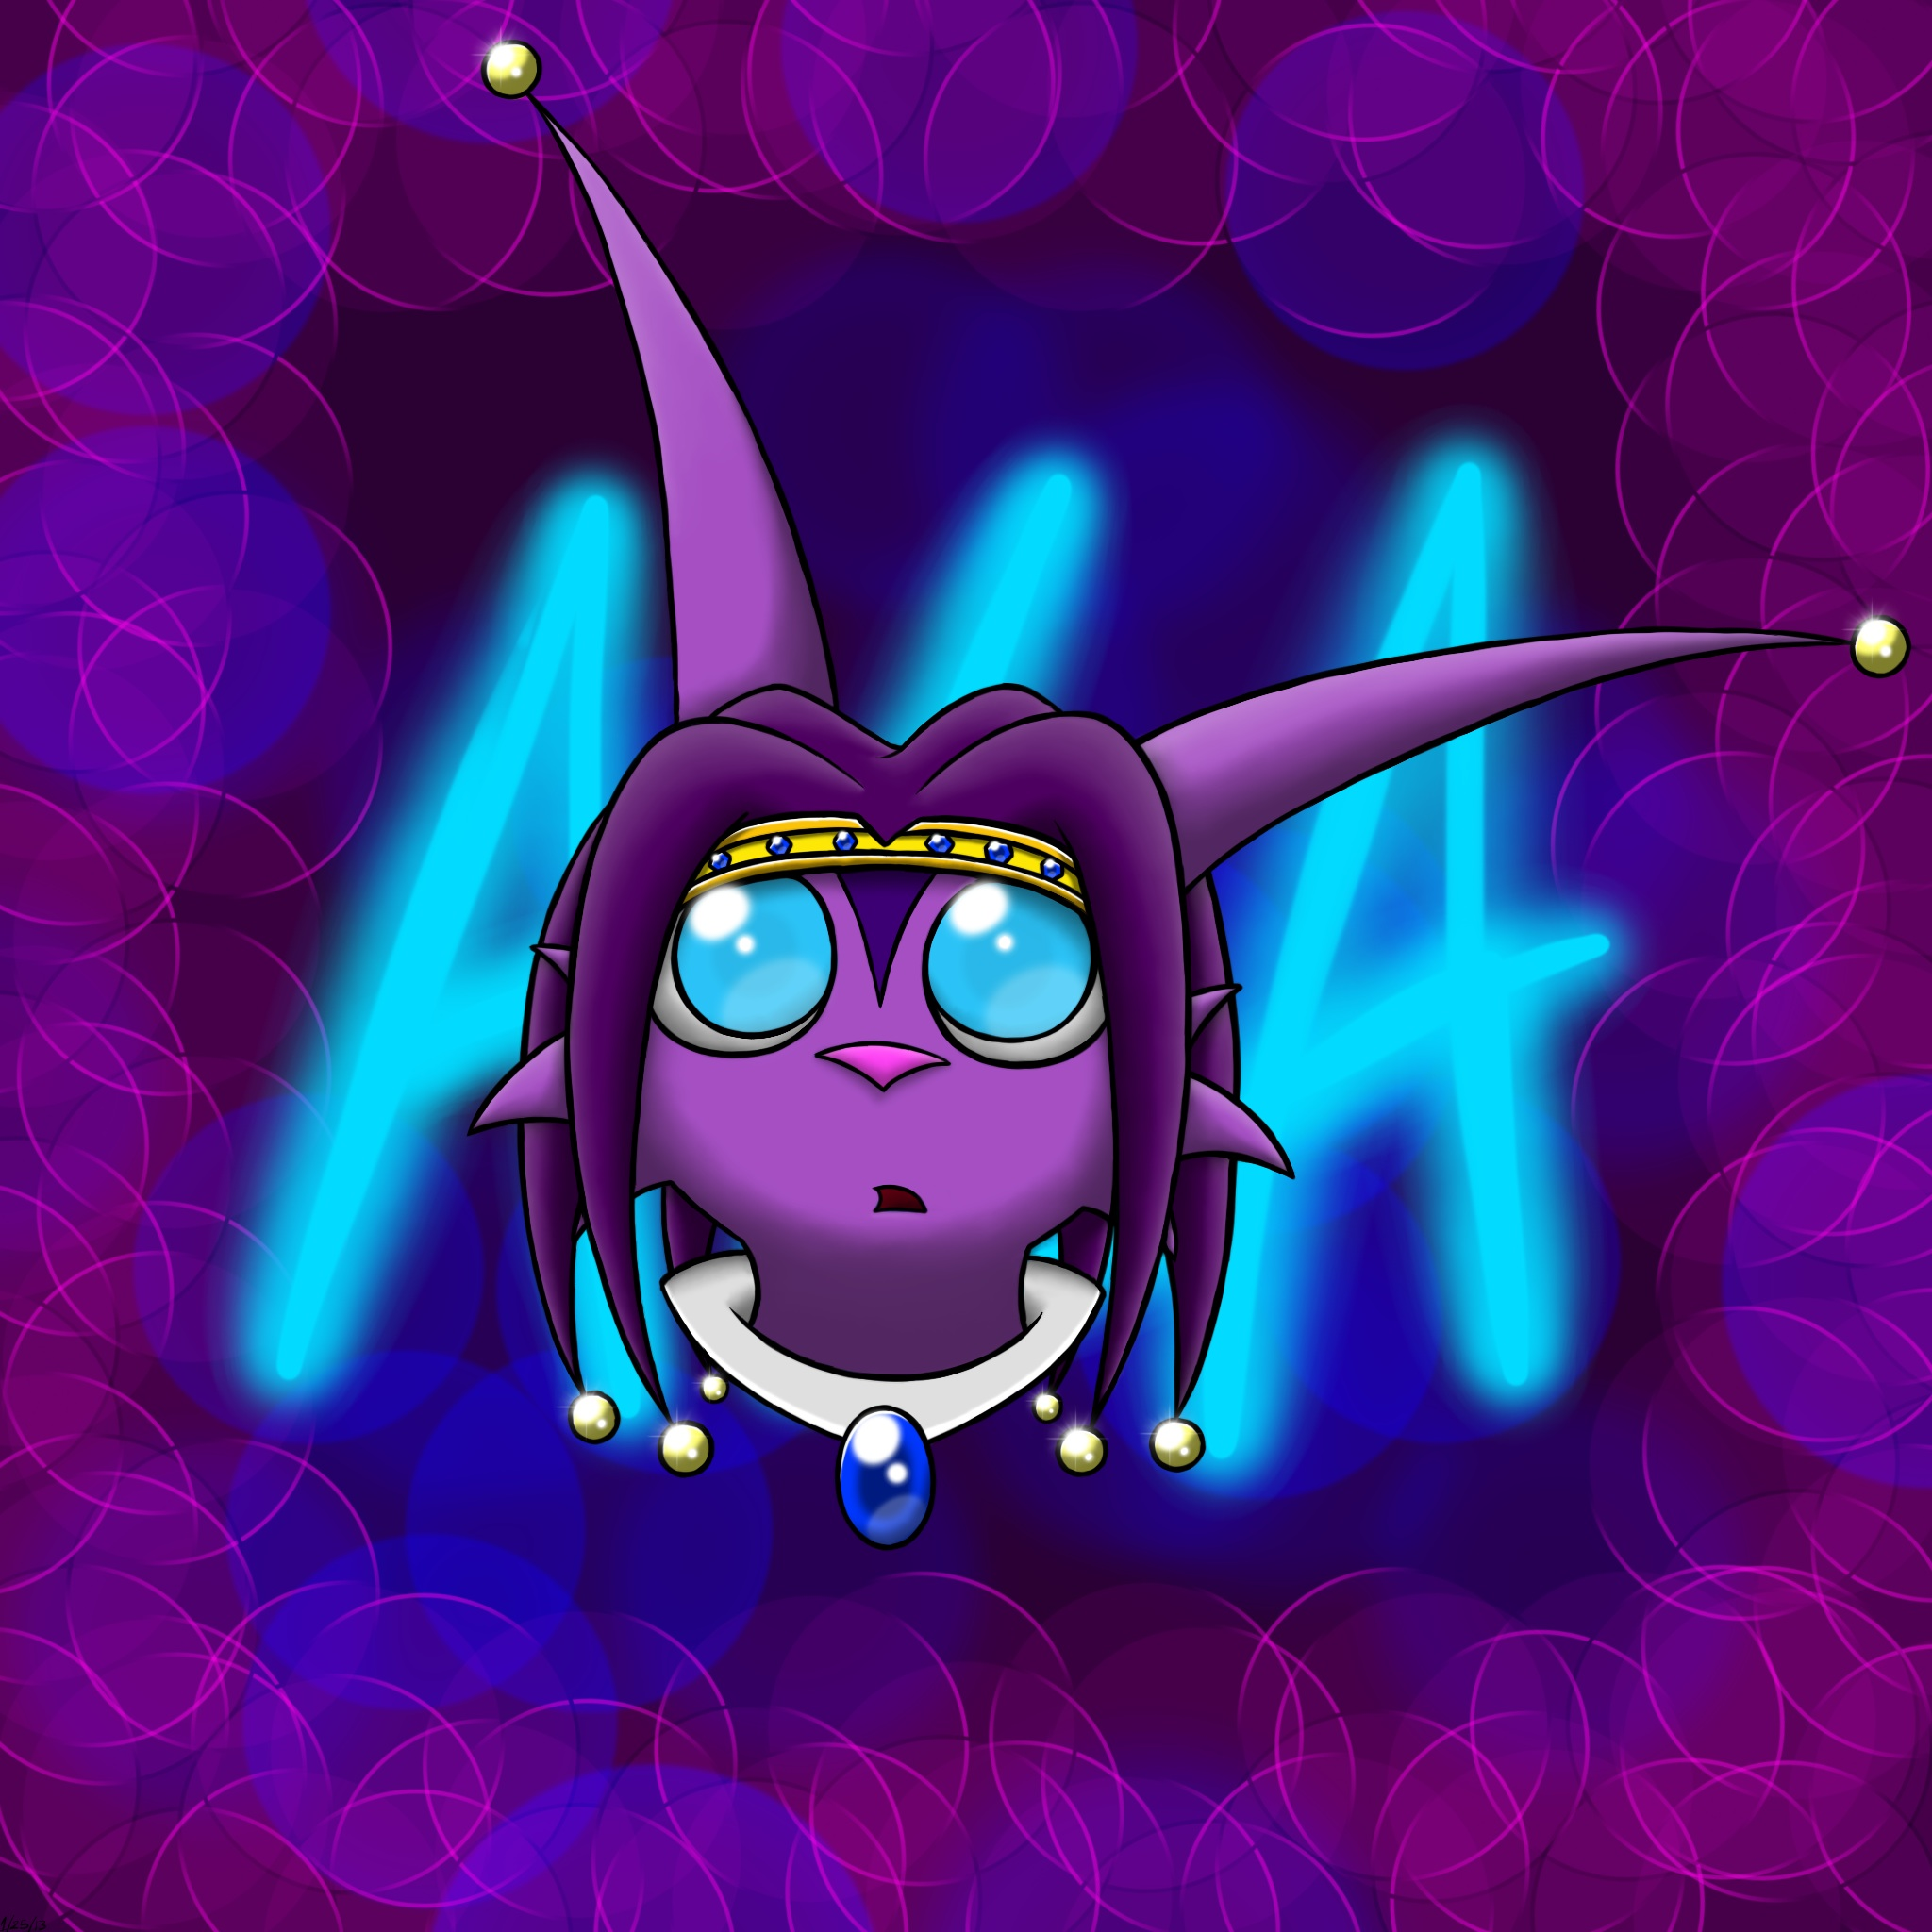 Jestloo's Profile Picture